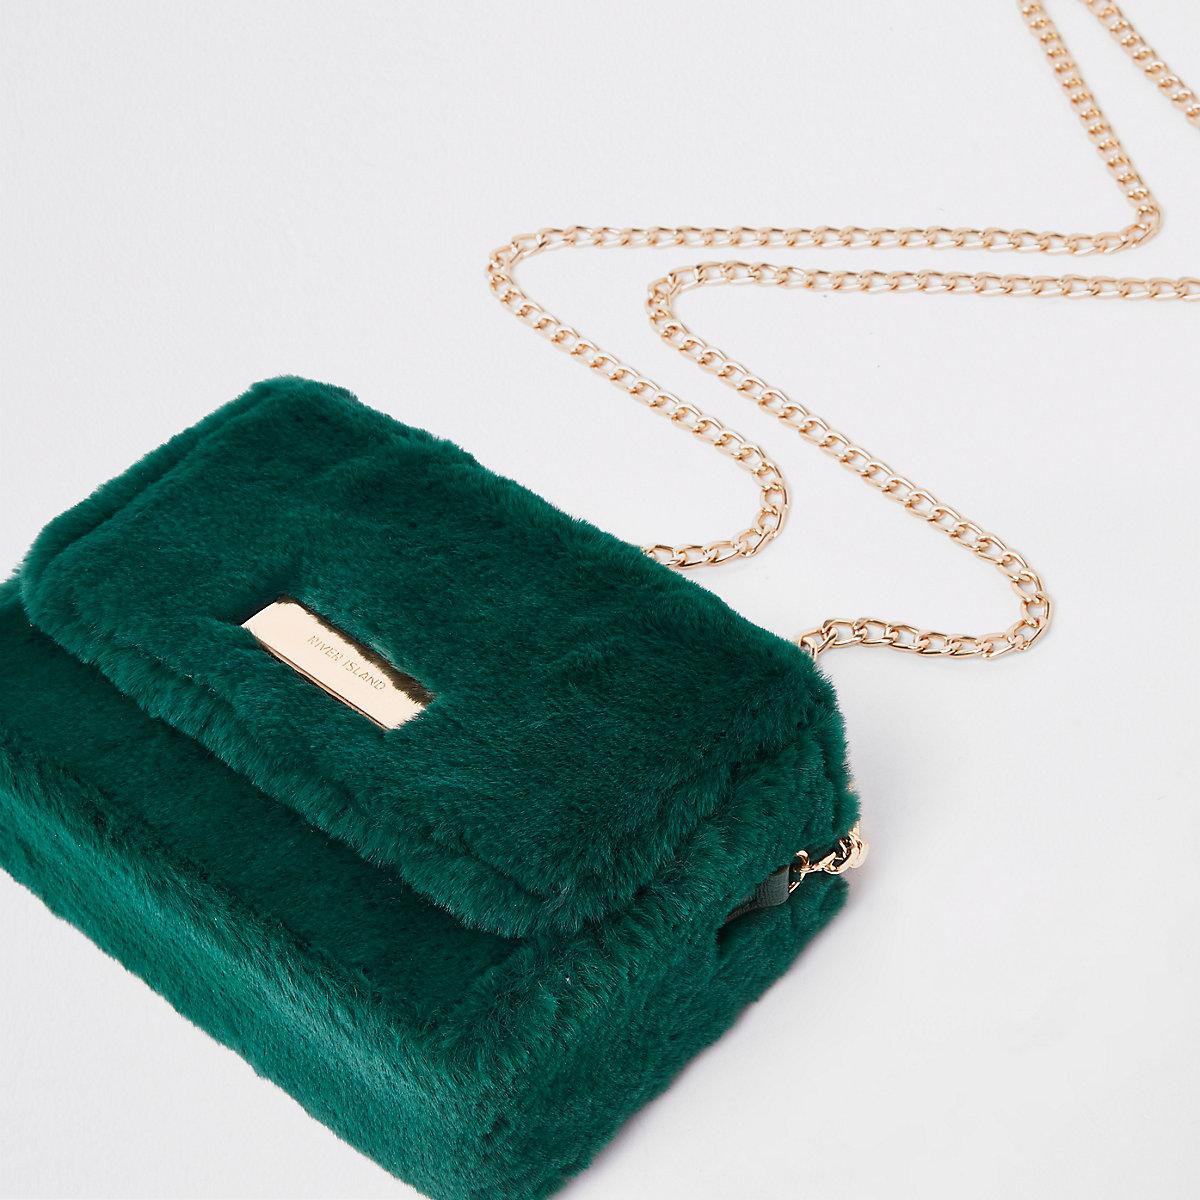 Dark green faux fur mini boxy cross body bag